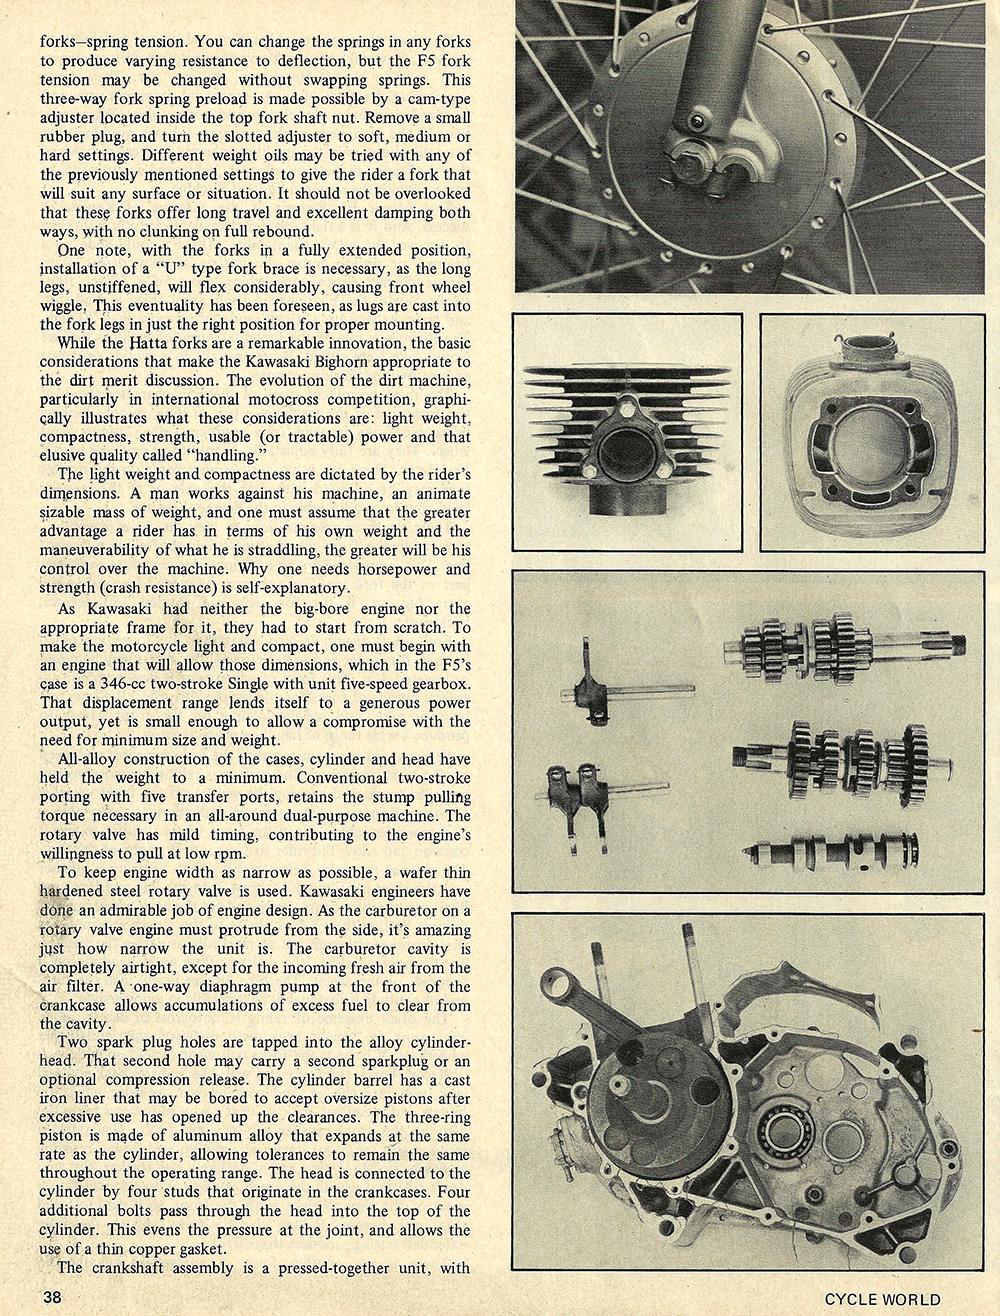 1970 Kawasaki F5 Bighorn road test 03.jpg